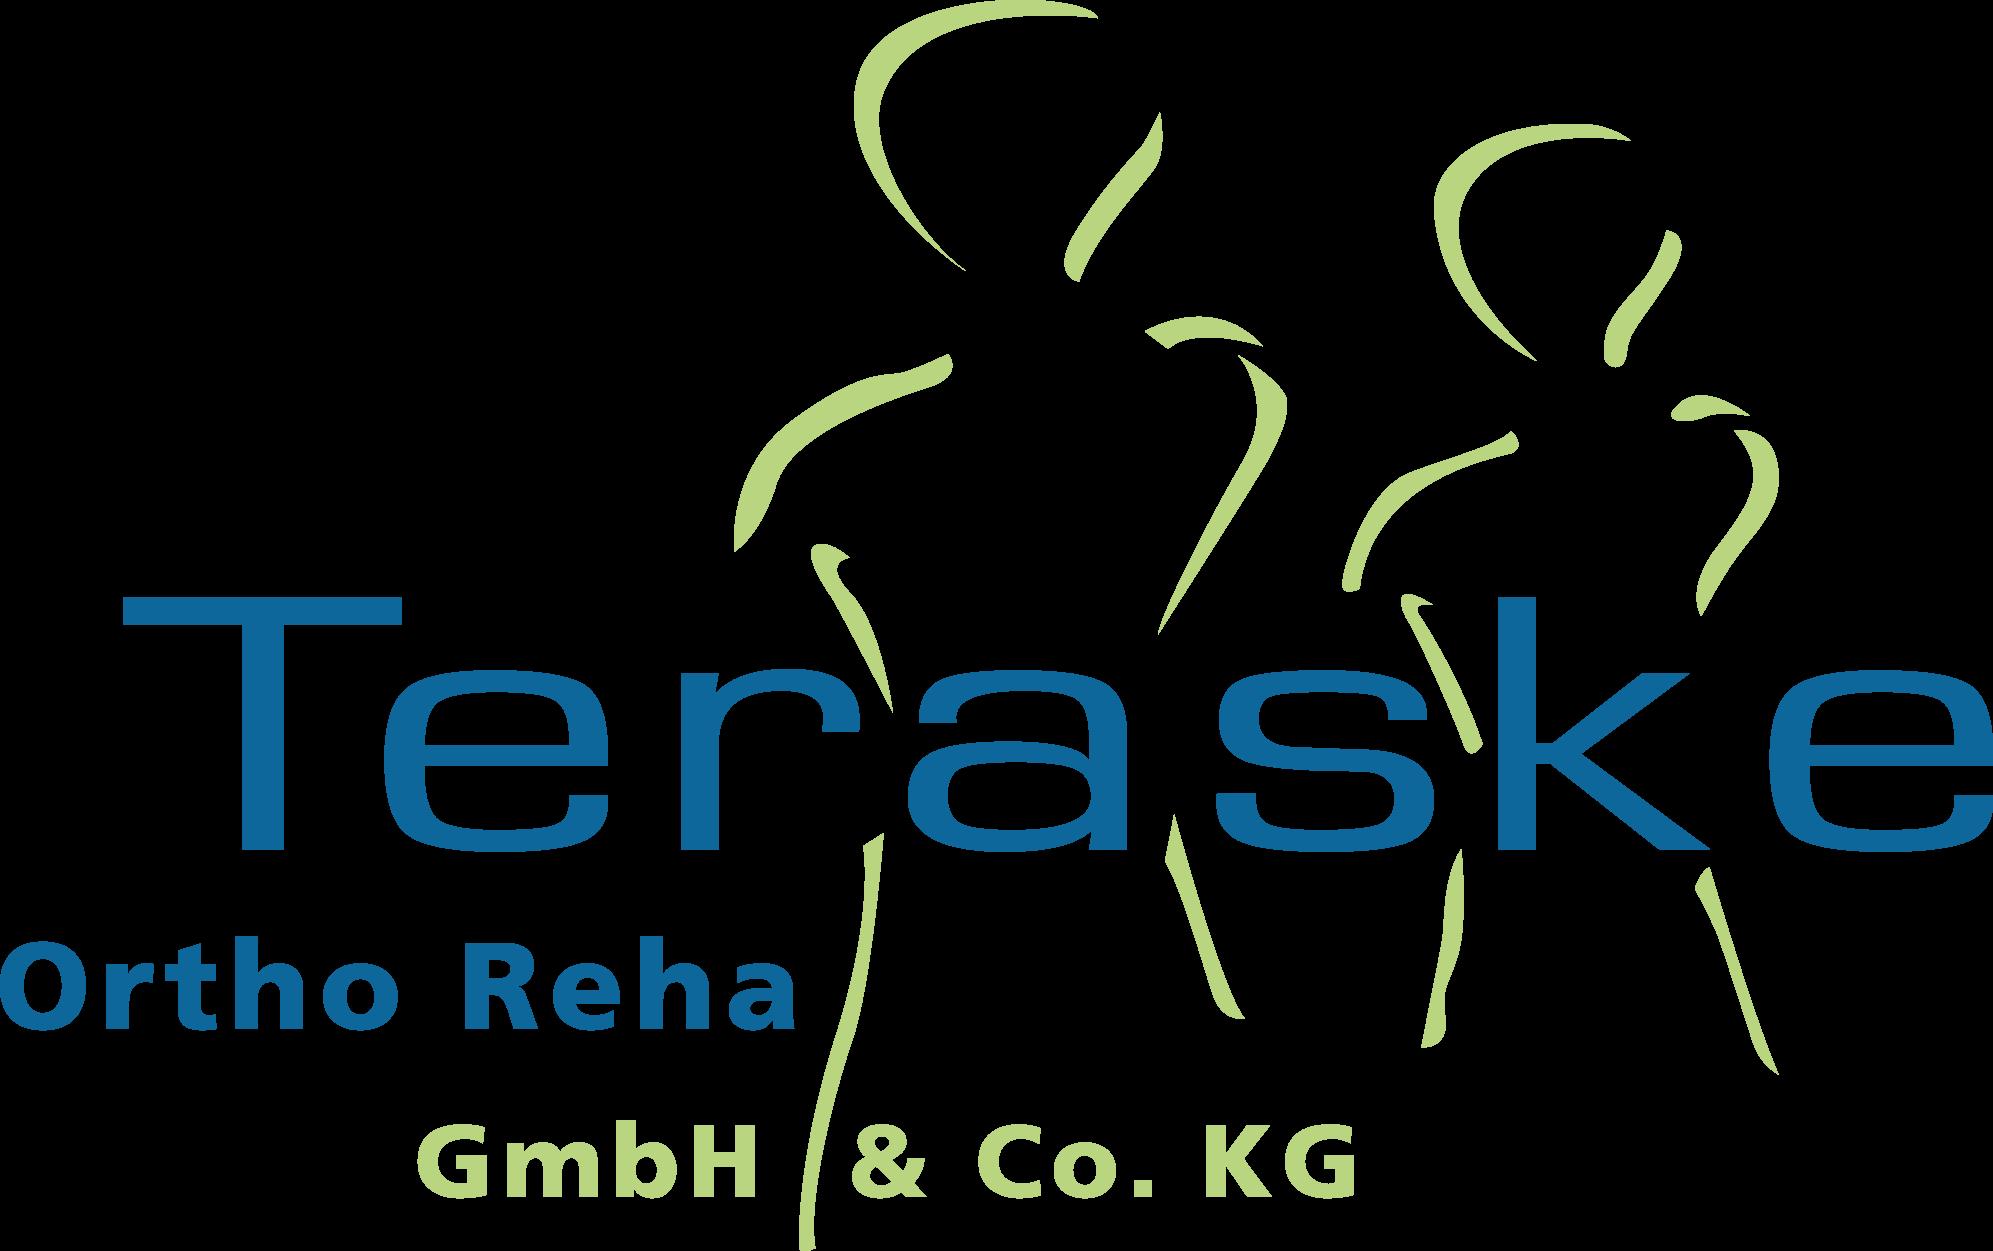 Teraske